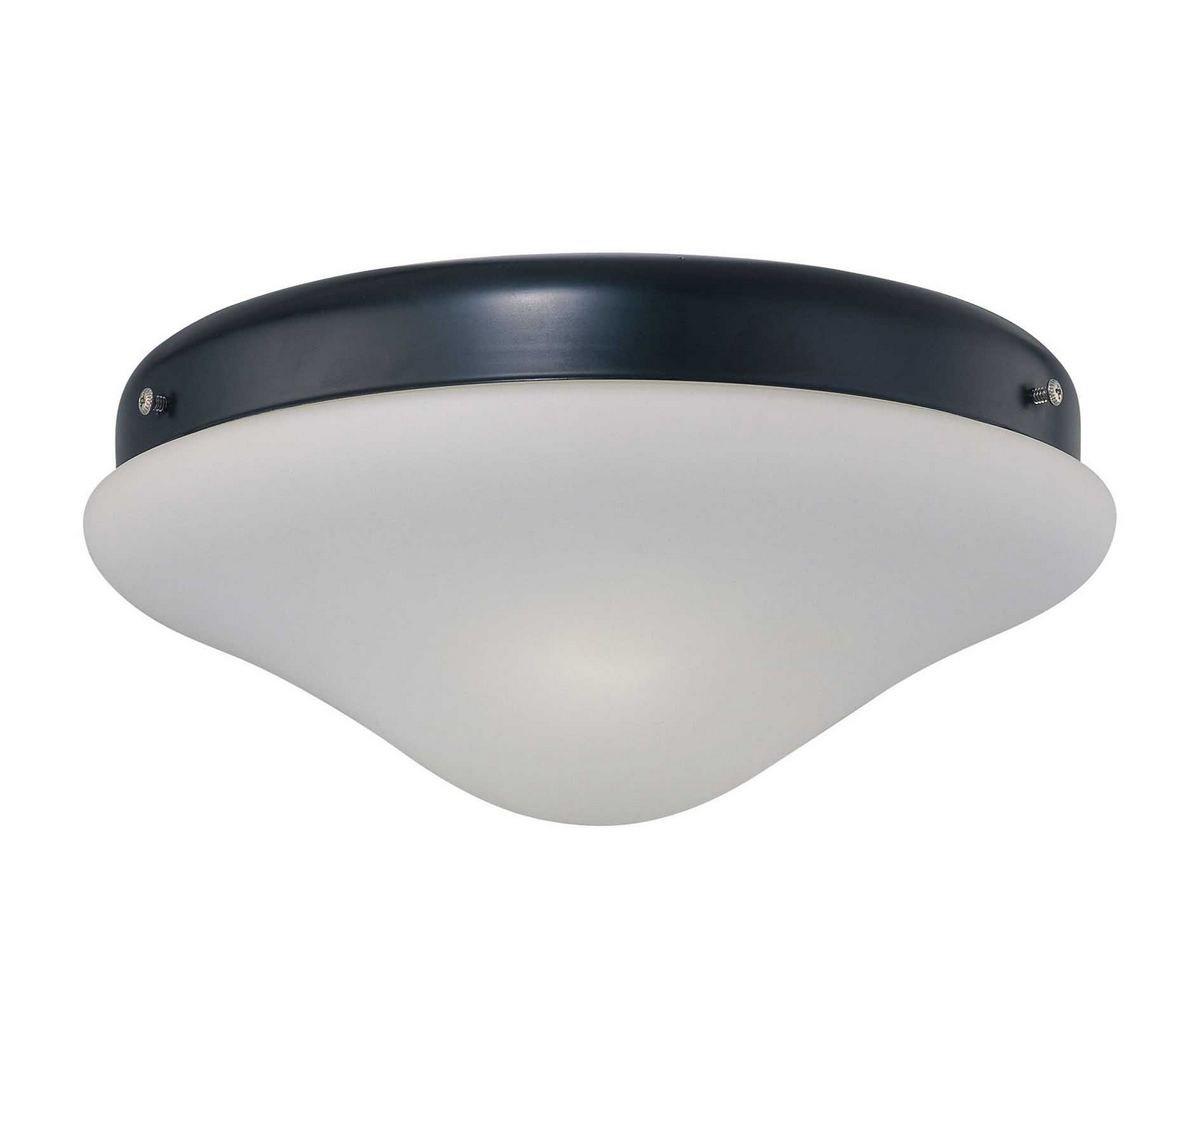 Savoy House FL524-FB Crimson 2-Light Fan-Light in Flat Black